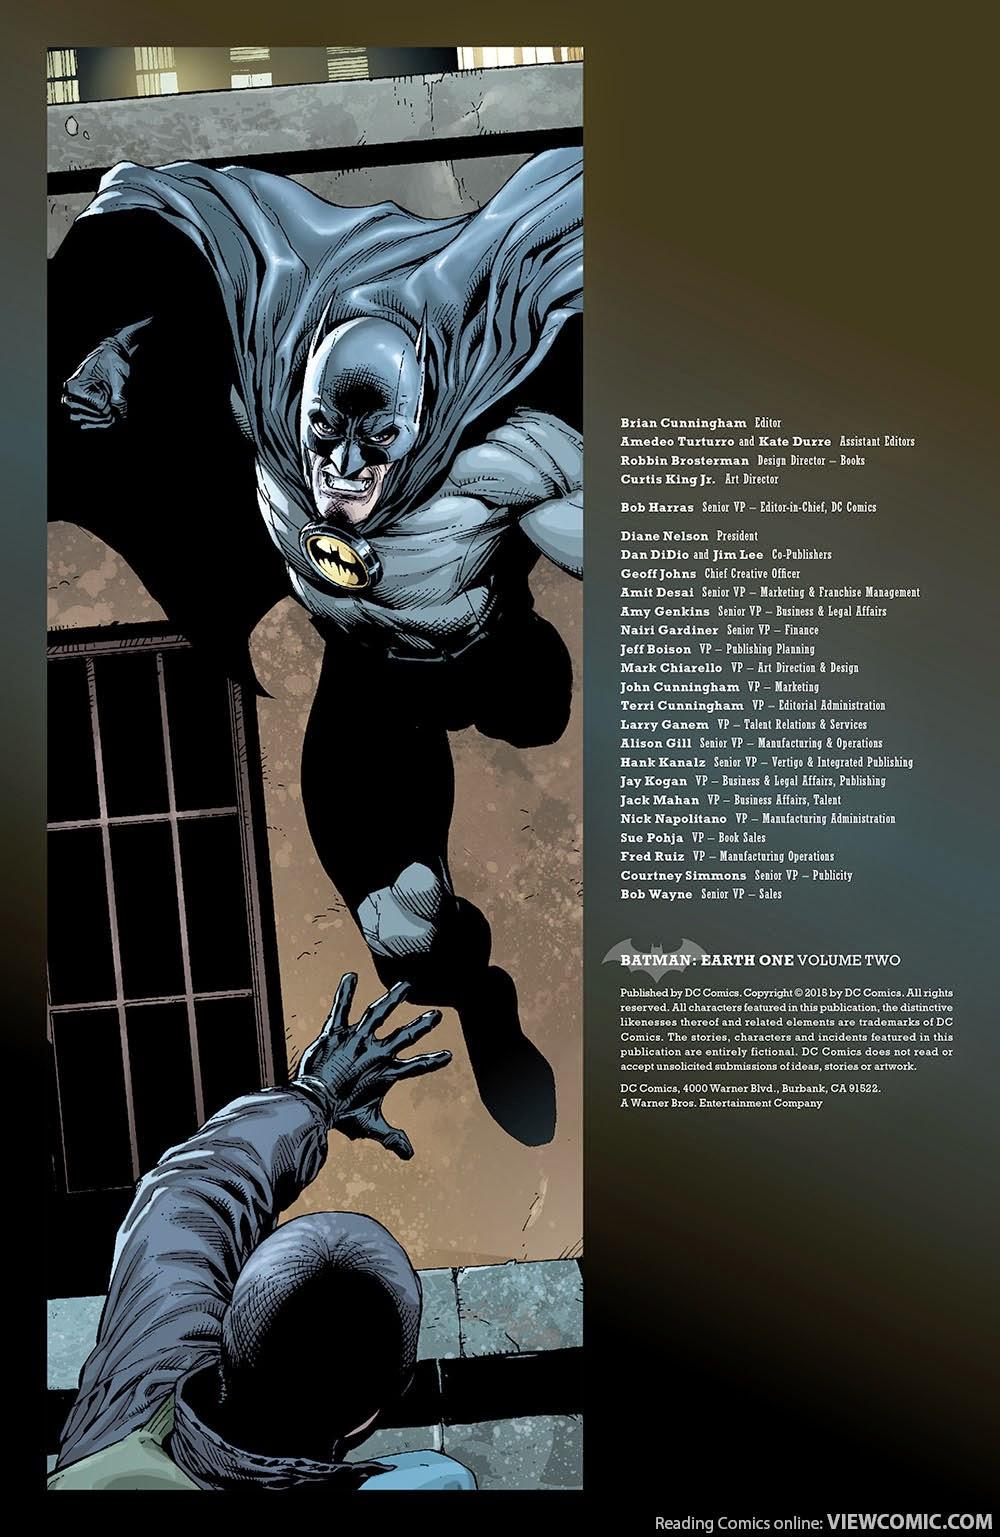 Pdf 2 volume earth batman one